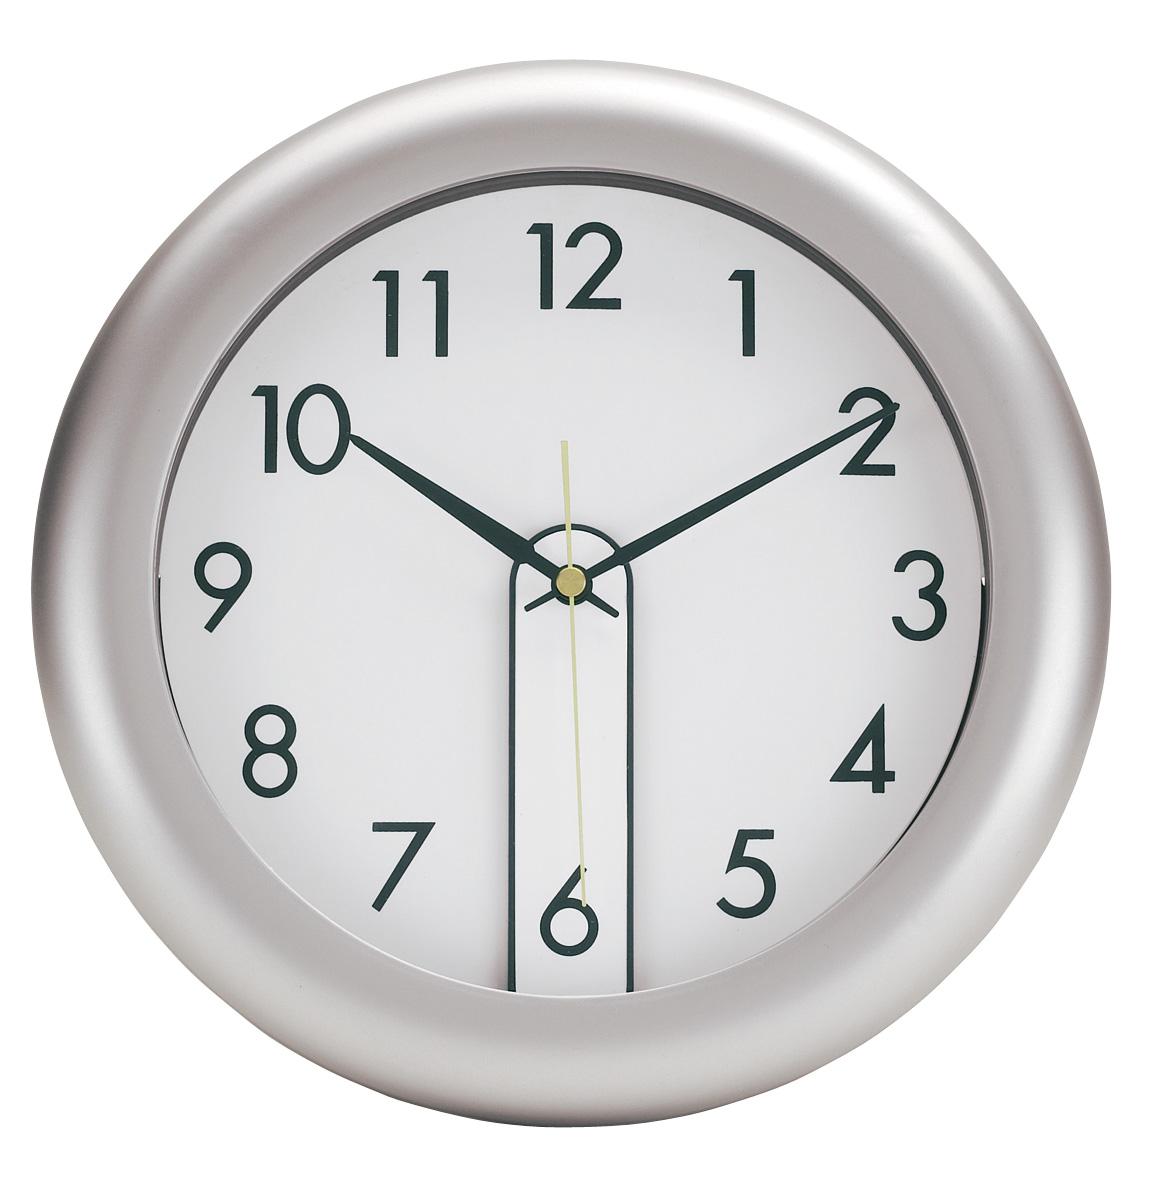 Mas promocionales - Relojes de pared ...